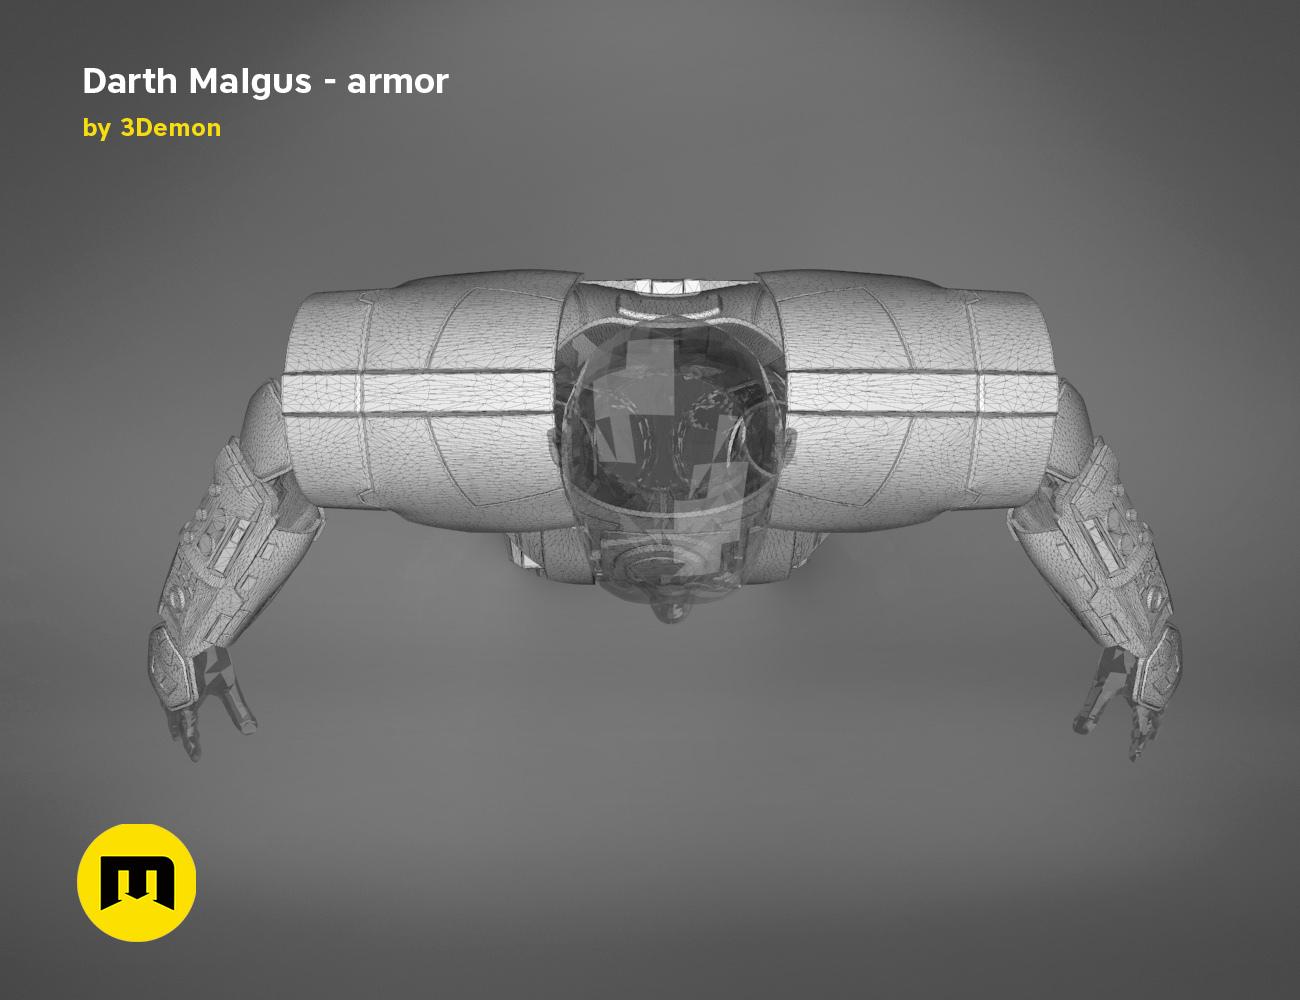 render_scene_darth-malgus-armor-mesh.23 kopie.jpg Download STL file Darth Malgus's full size armor • Design to 3D print, 3D-mon